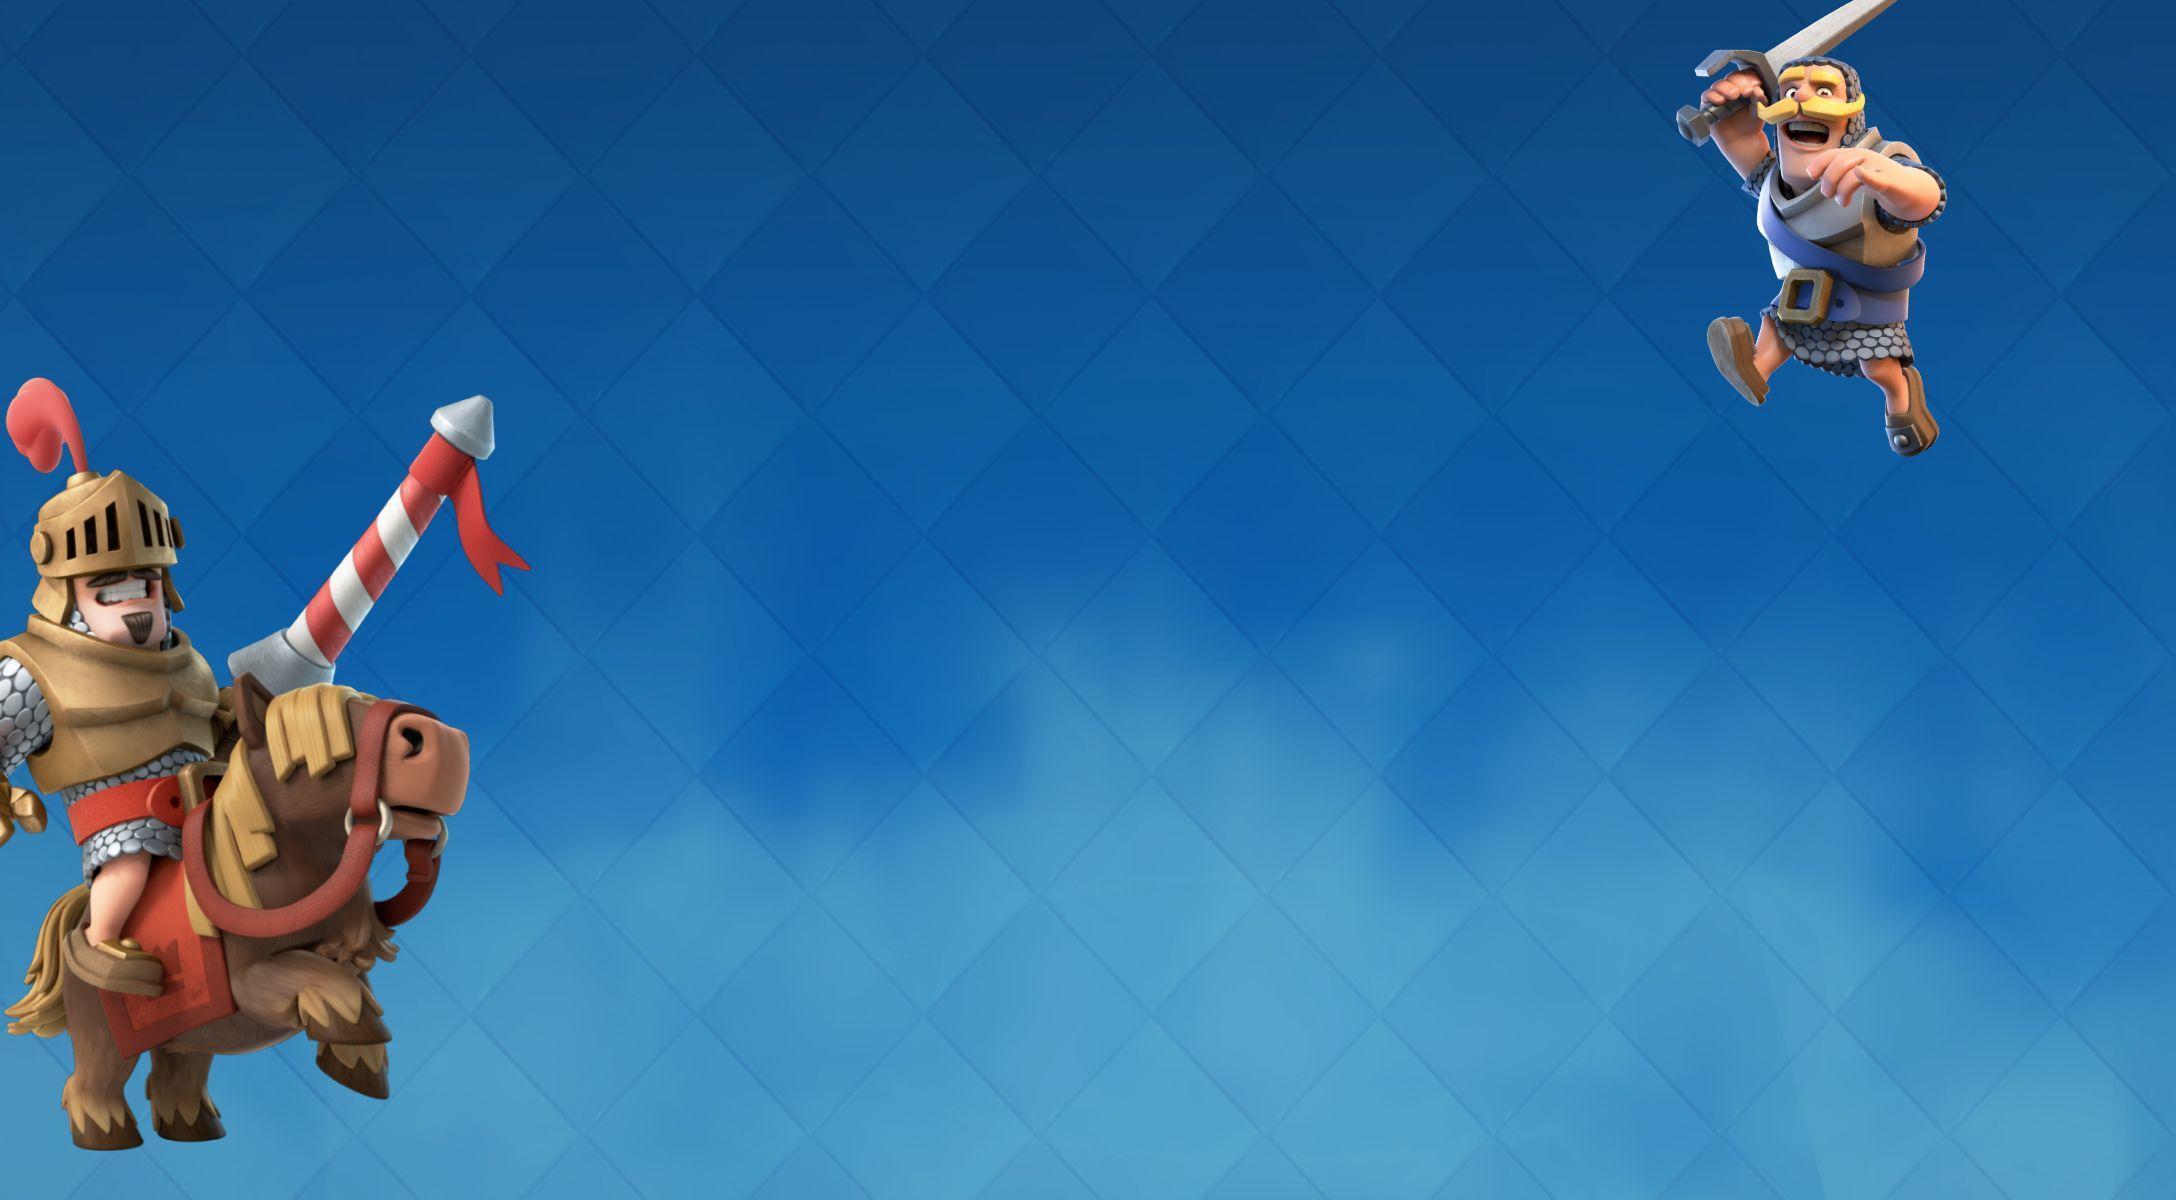 clash royale wallpaper - Tag | Download HD Wallpaperhd wallpapers ...